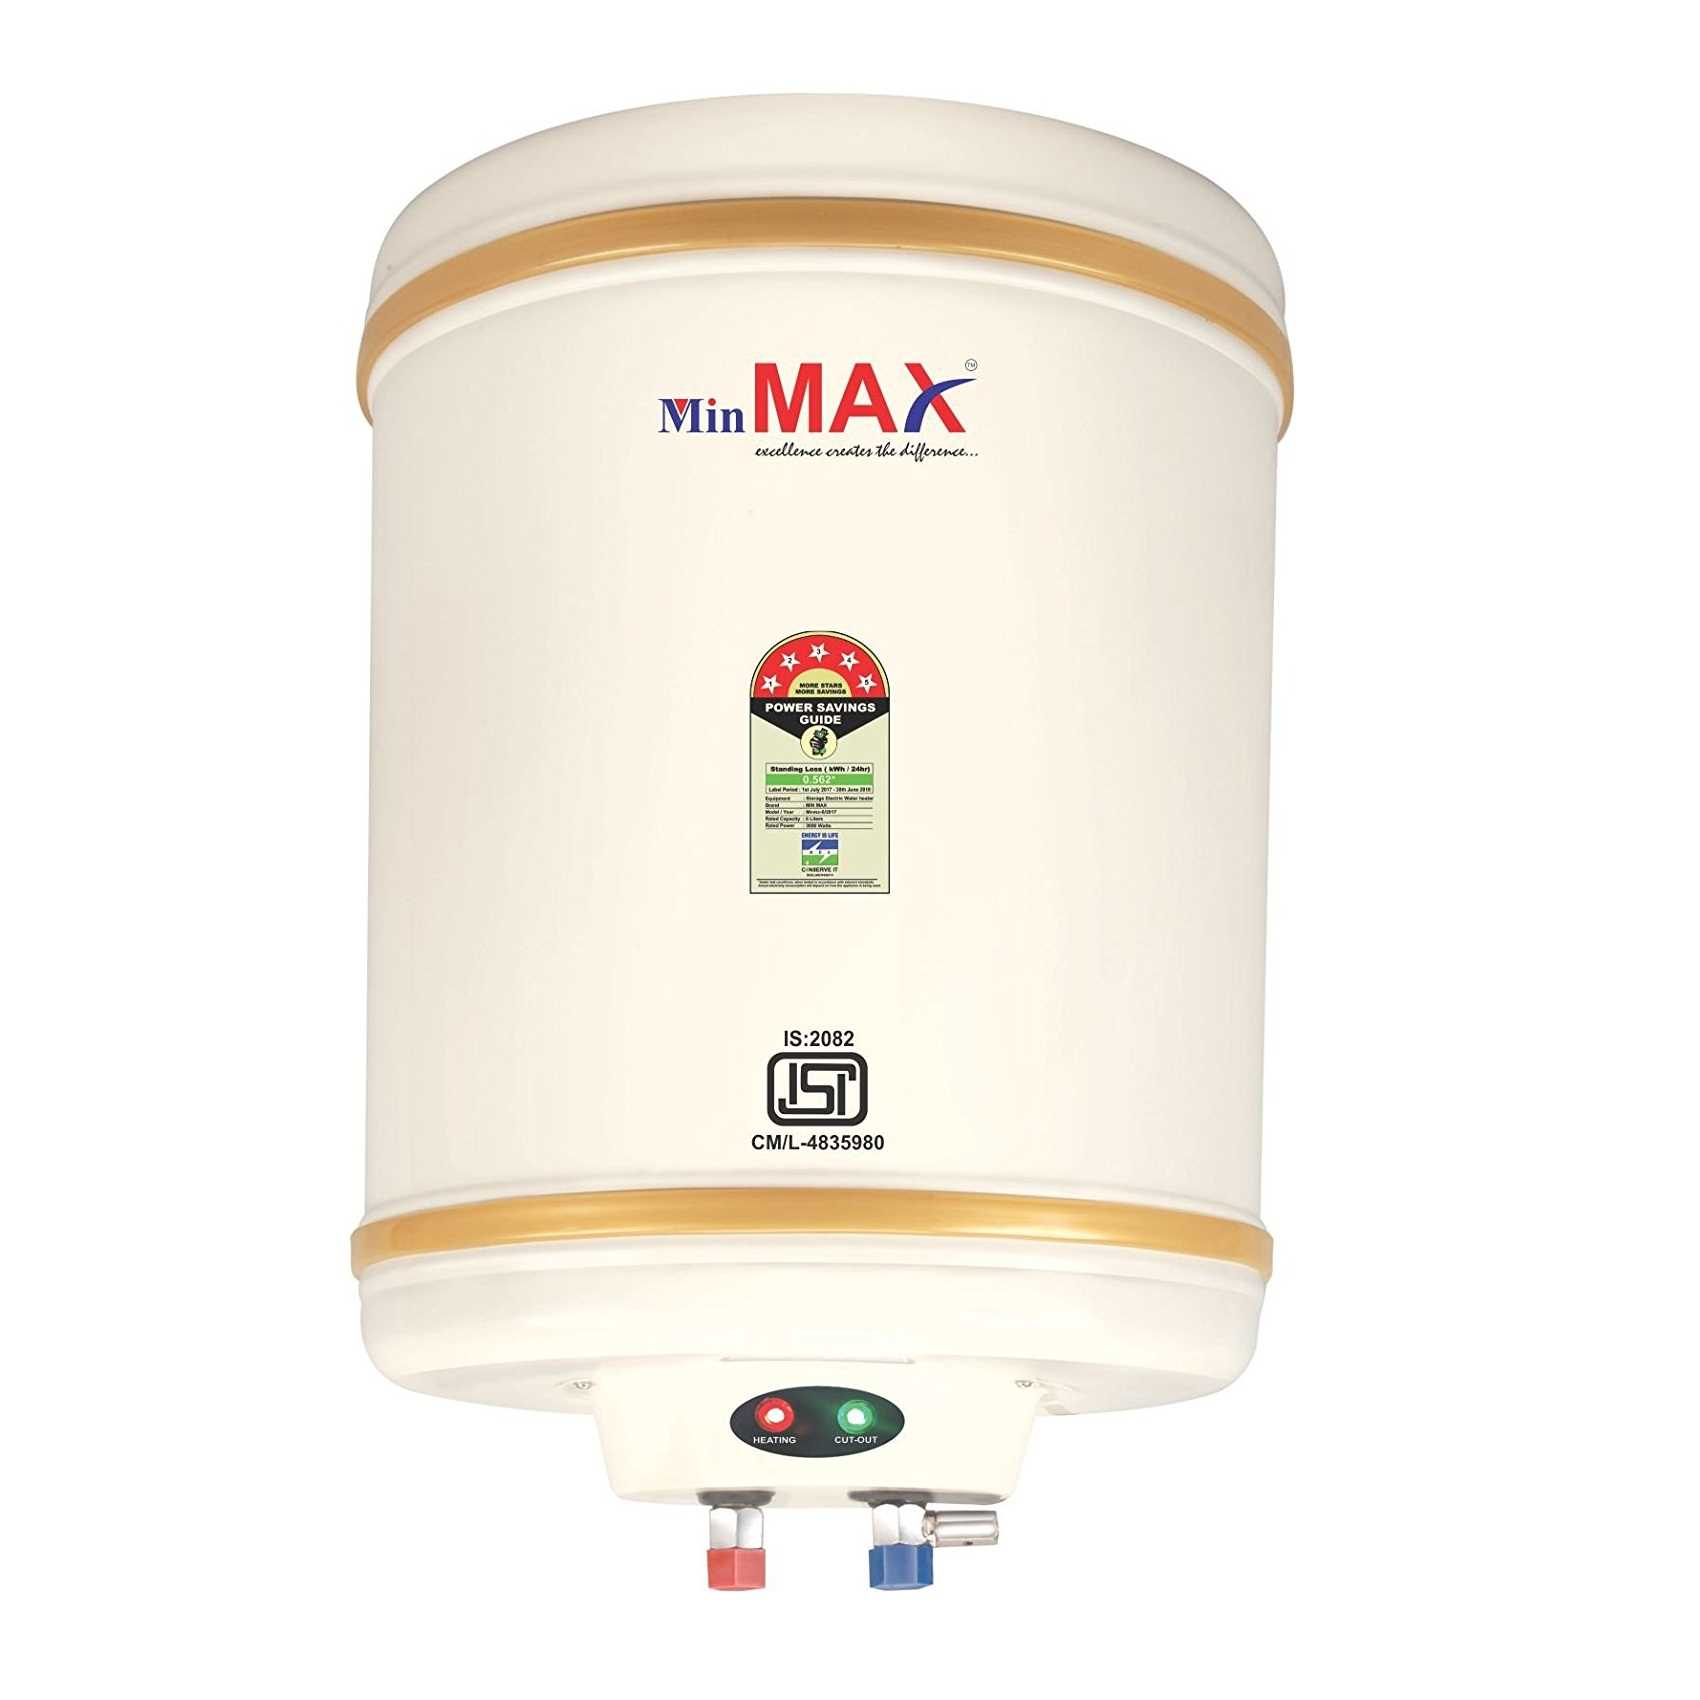 Min Max Eco-EG 15 Litre Storage Water Heater